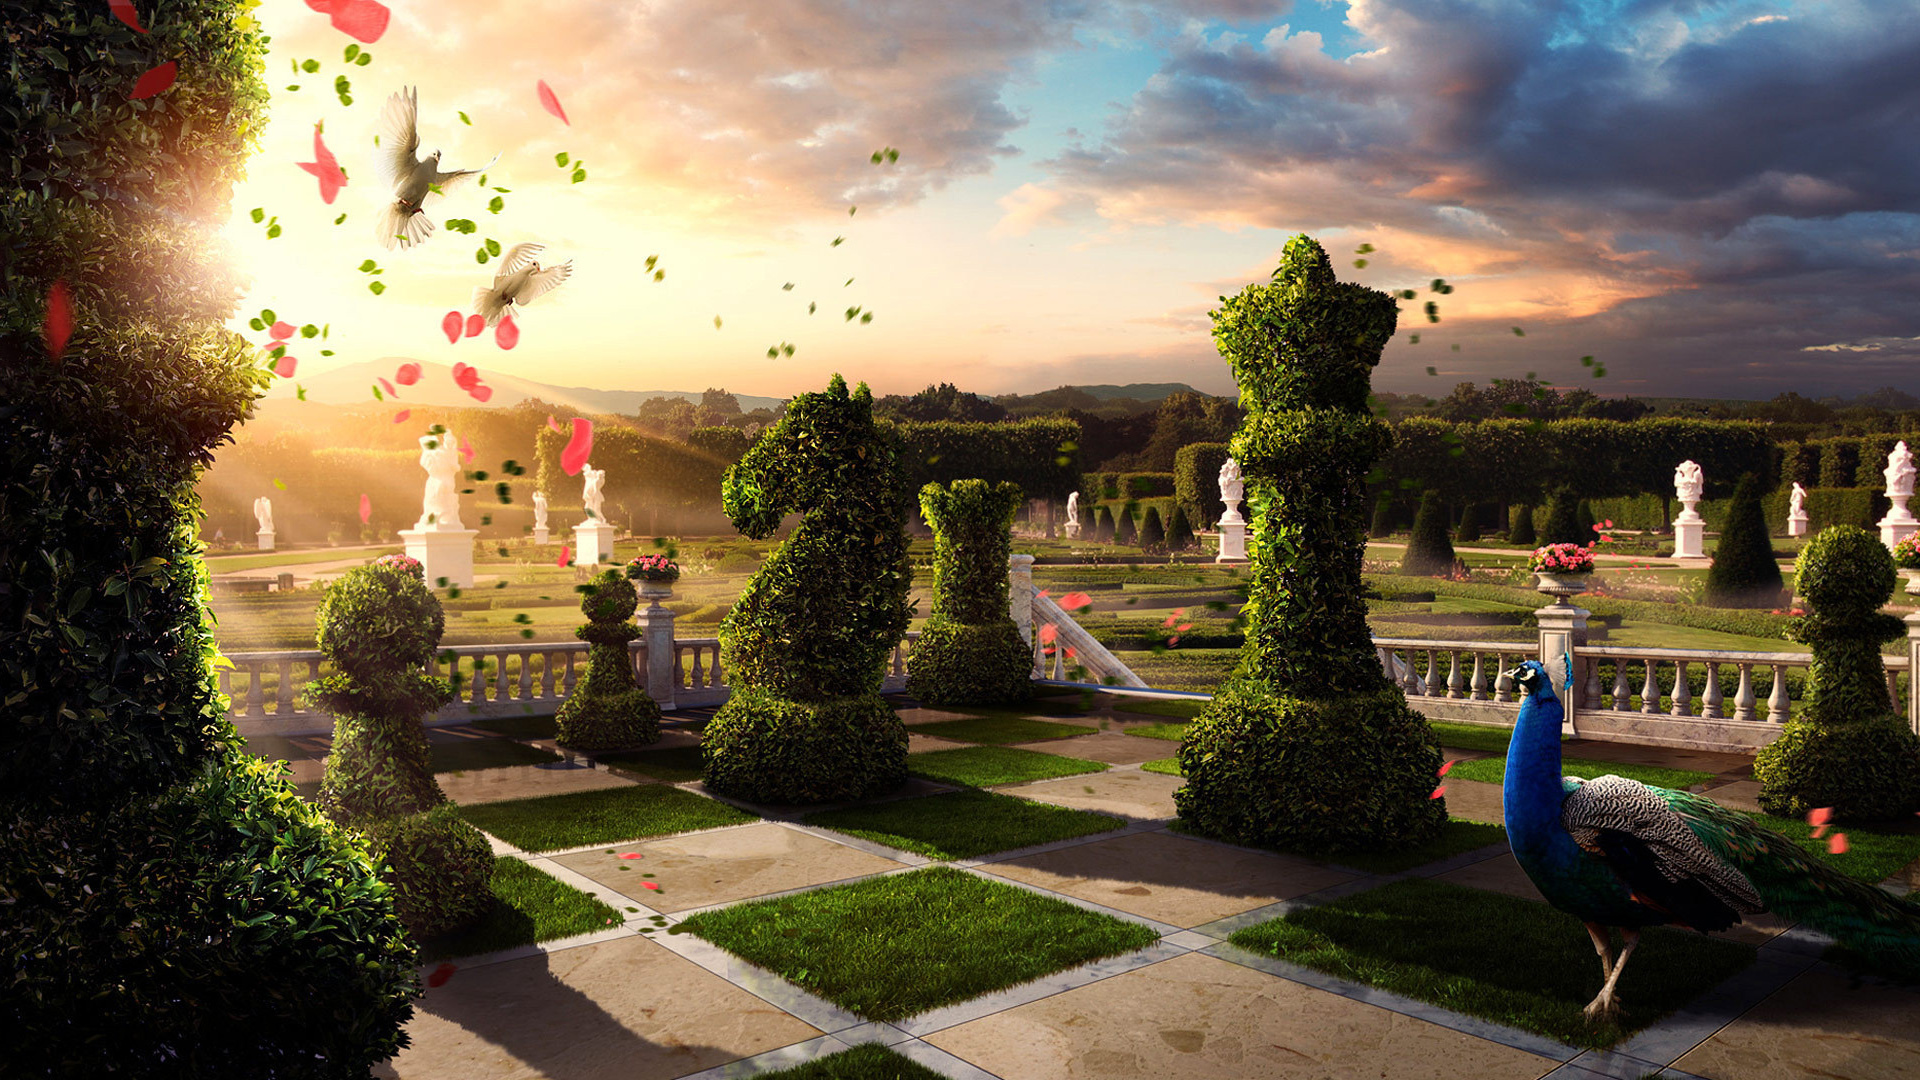 Fond d'écran jeu d'échecs, jardin avec arbres sculptés en forme de pièces d'échecs